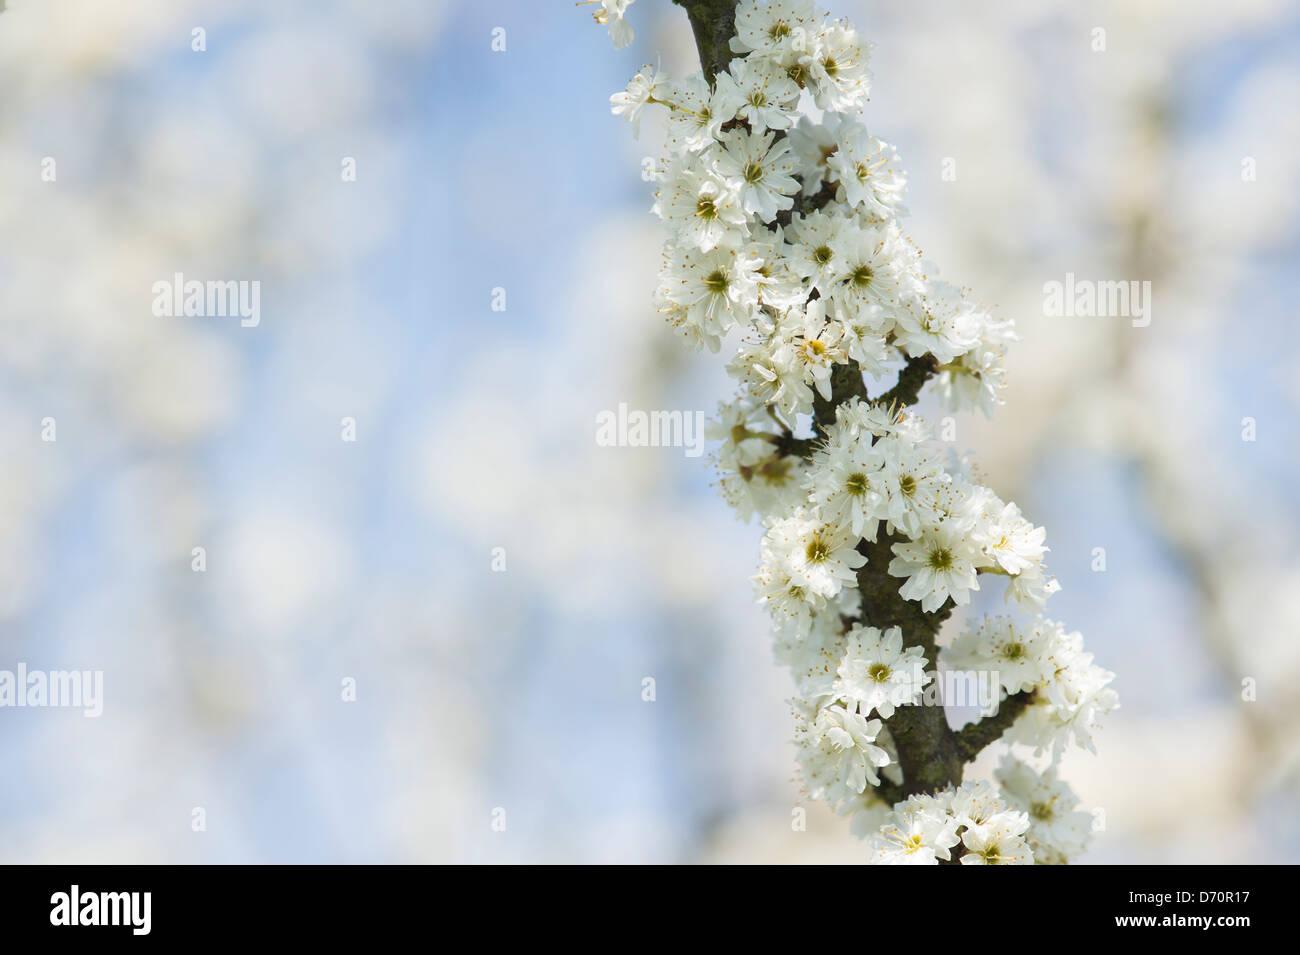 Prunus Spinosa Plena. Double flowered Blackthorn / Sloe tree blossom - Stock Image